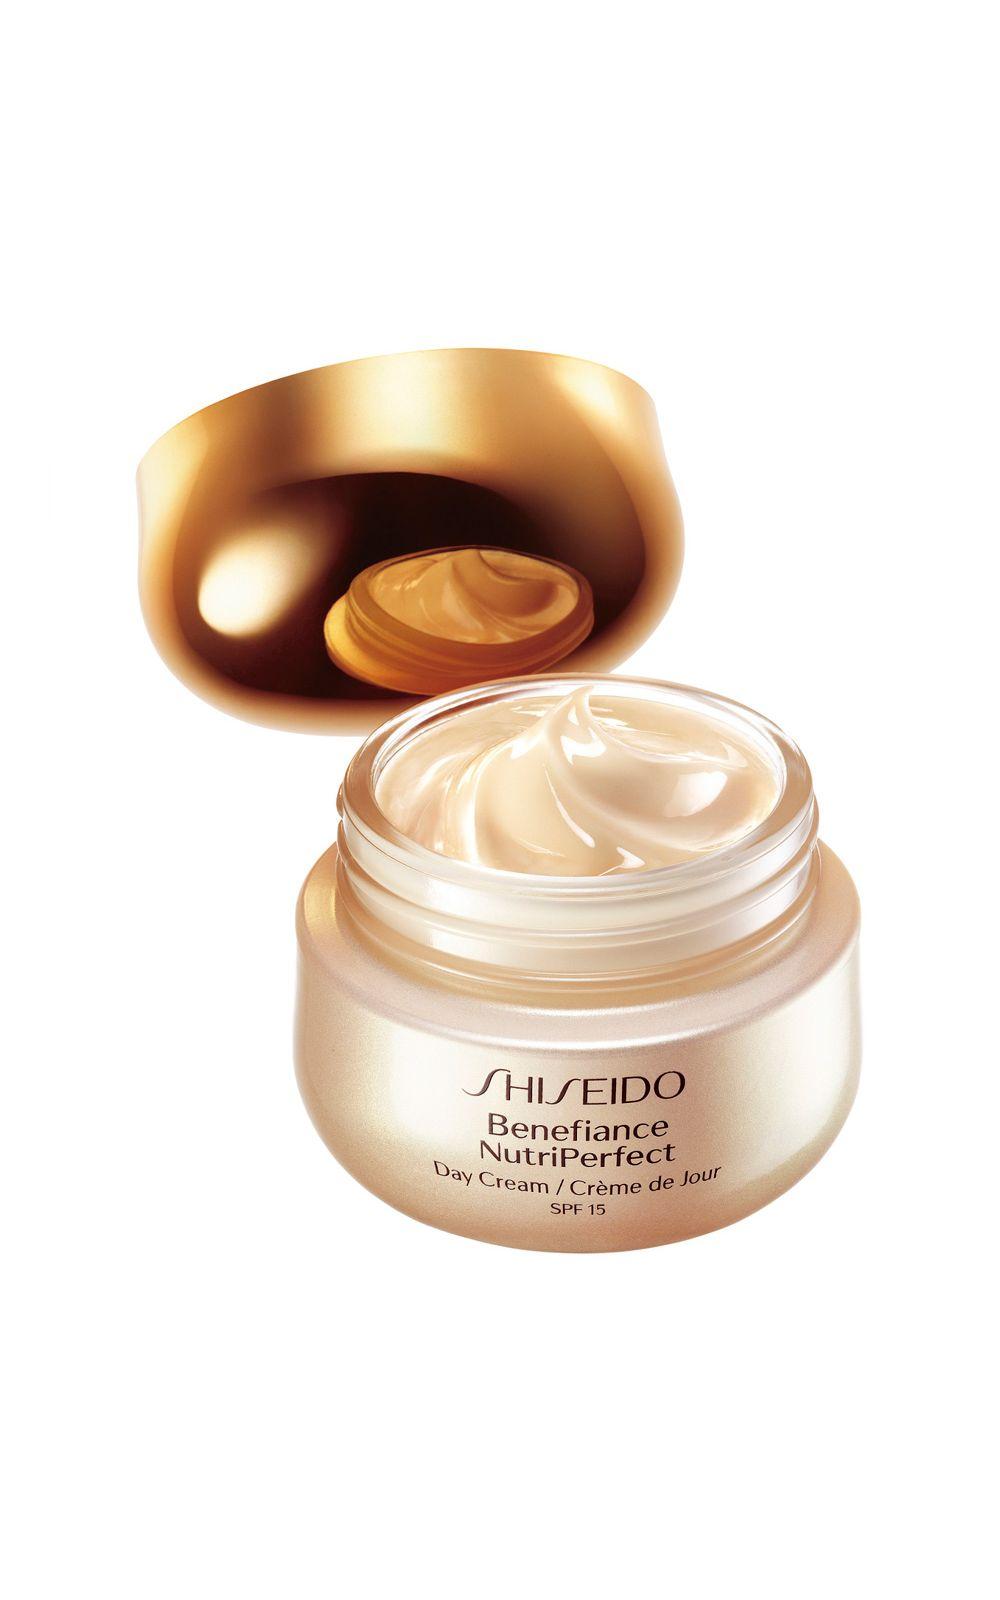 Foto 2 - Creme Nutritivo para peles Maduras Shiseido Benefiance Nutriperfect Day Cream Spf15 - 50ml